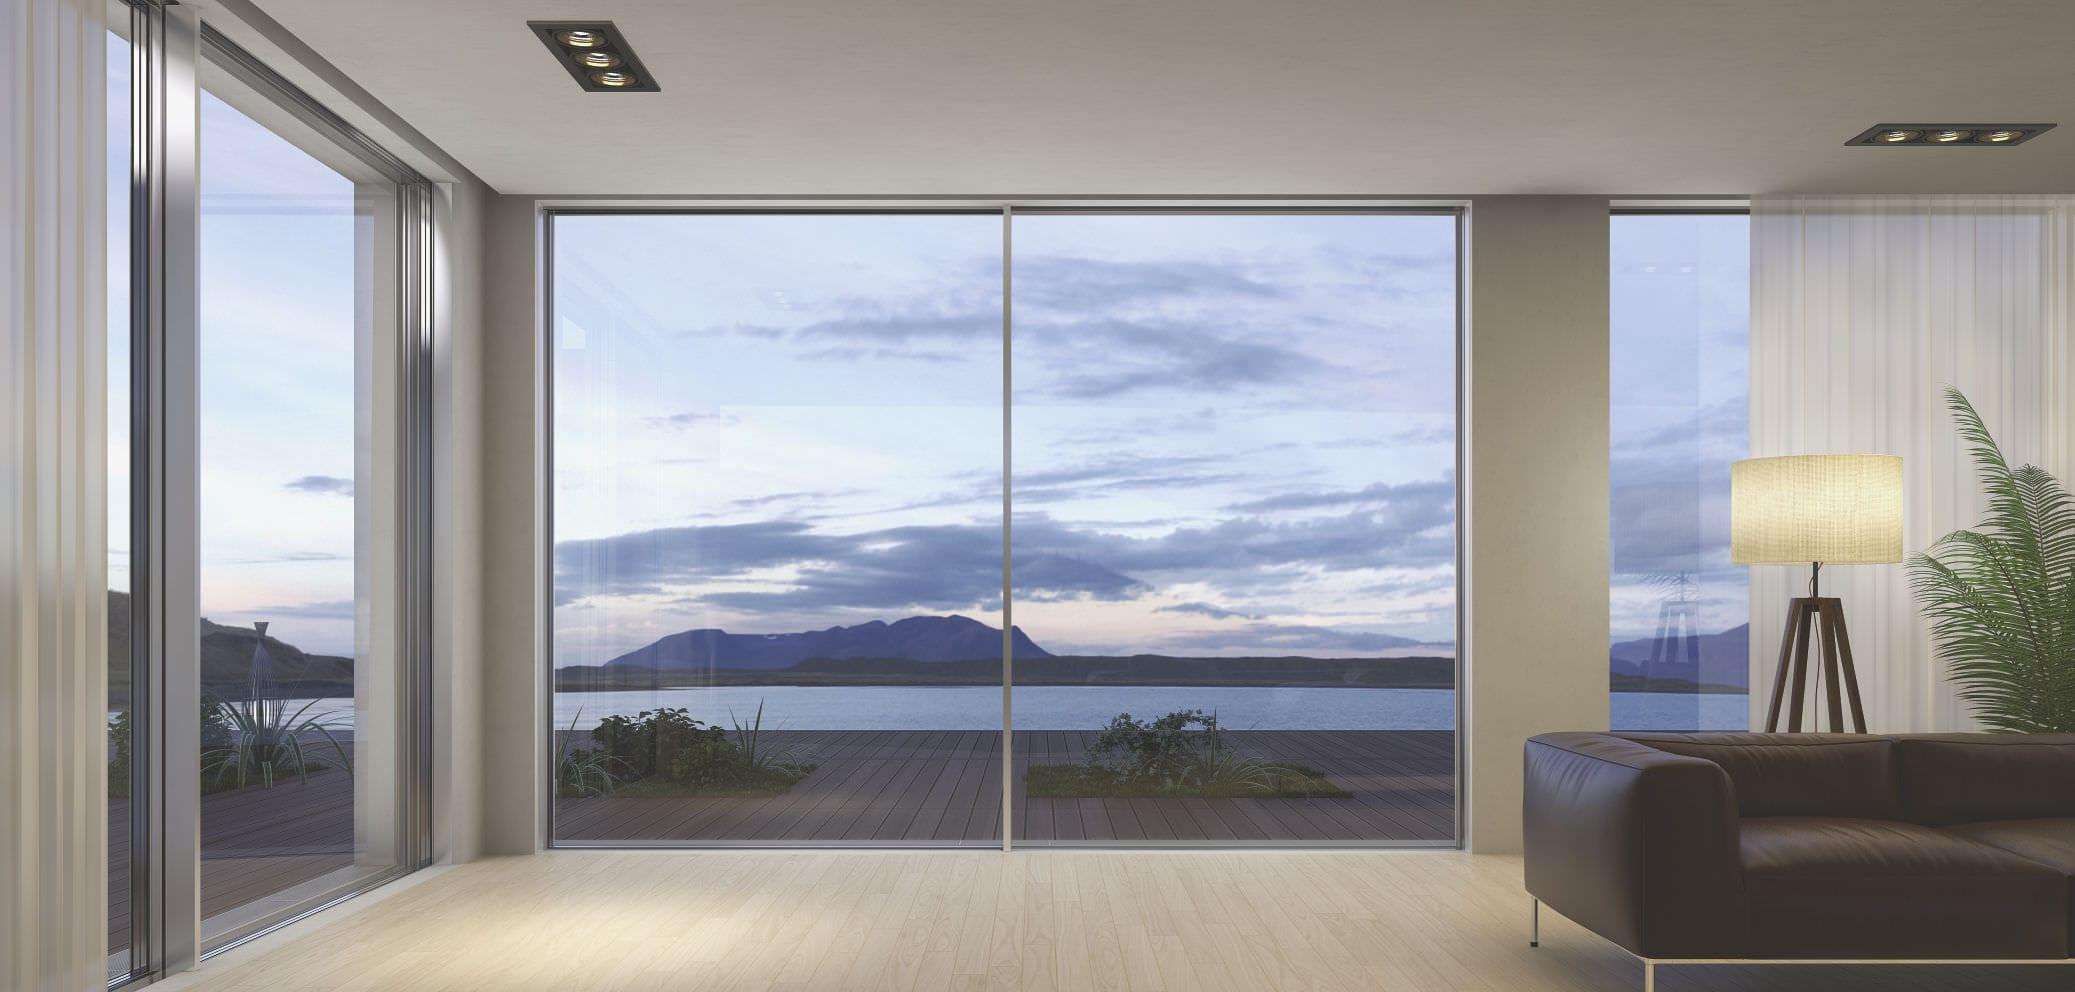 Sliding Patio Door Aluminum Triple Glazed Fluo